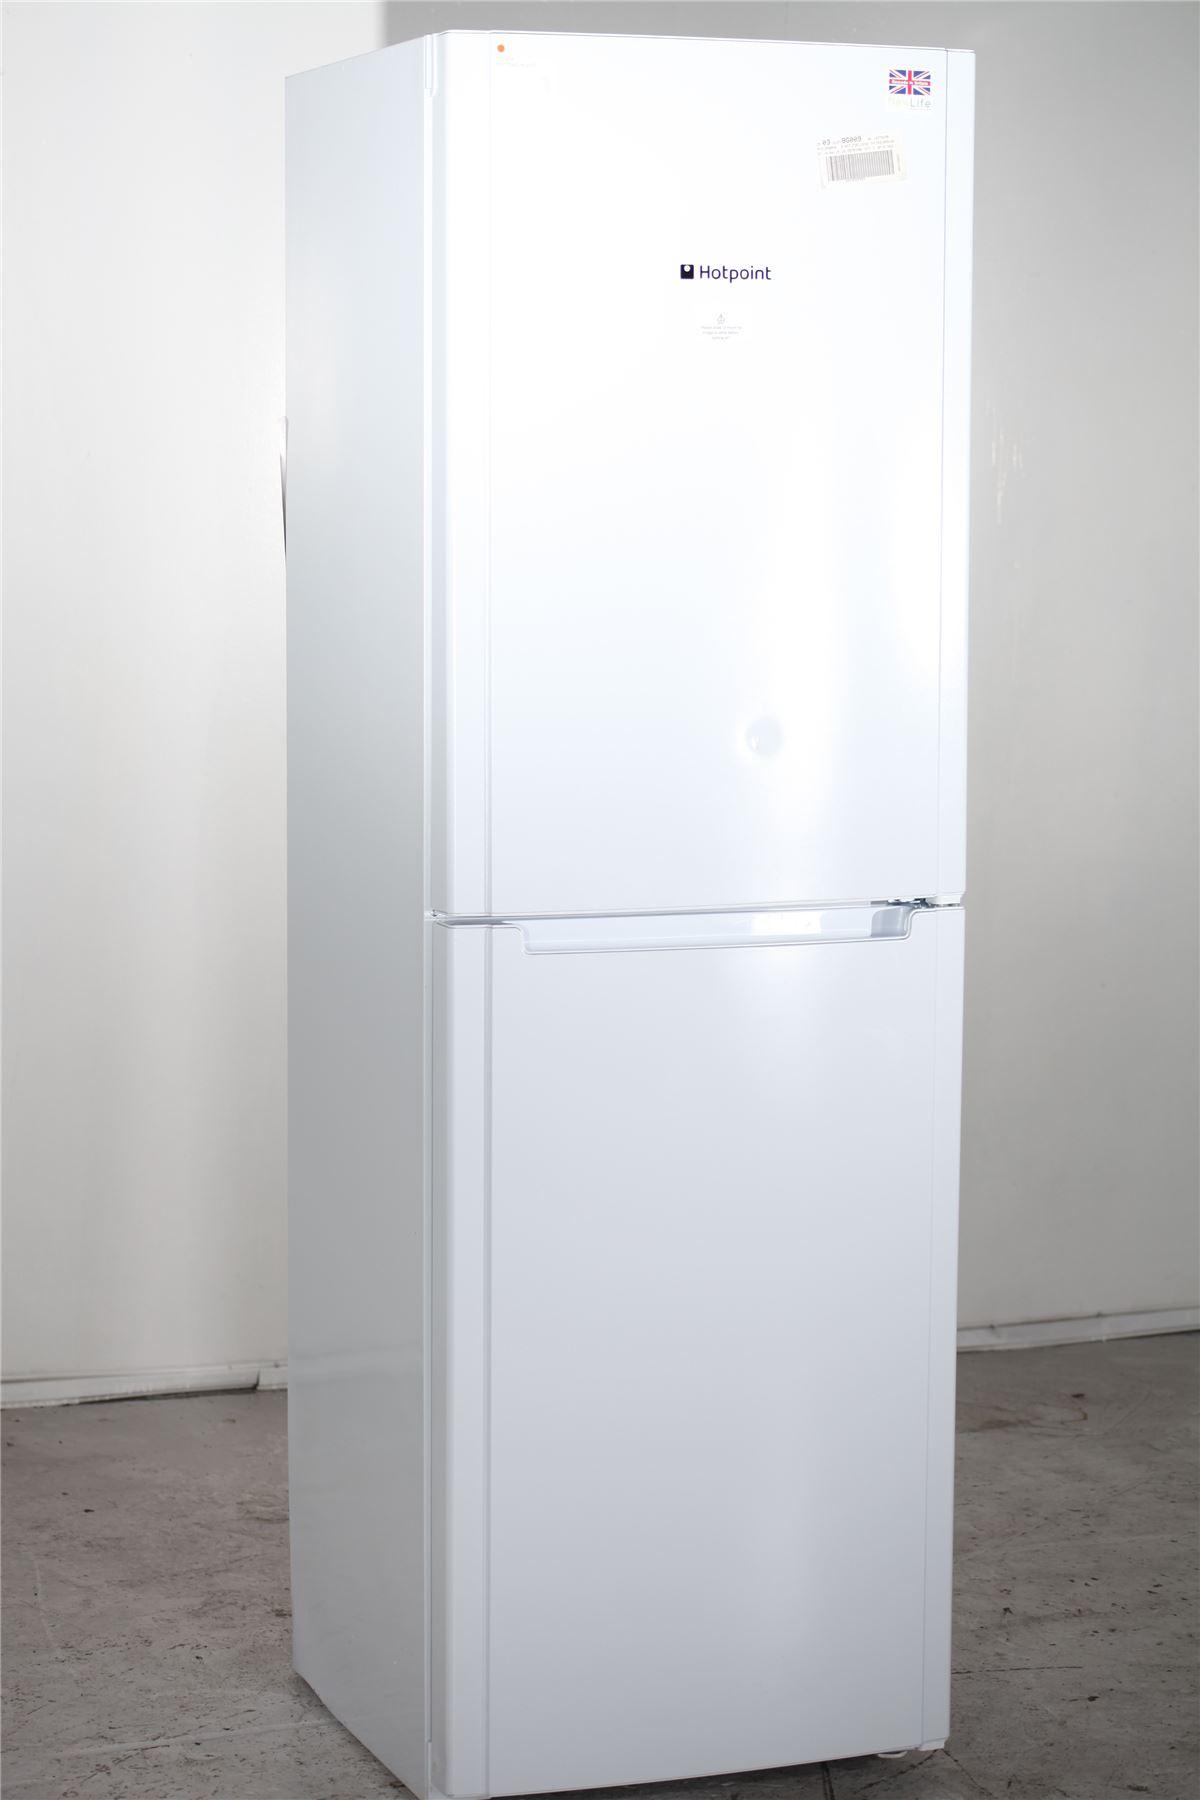 preloved hotpoint fridge freezer fsfl1810p white for. Black Bedroom Furniture Sets. Home Design Ideas